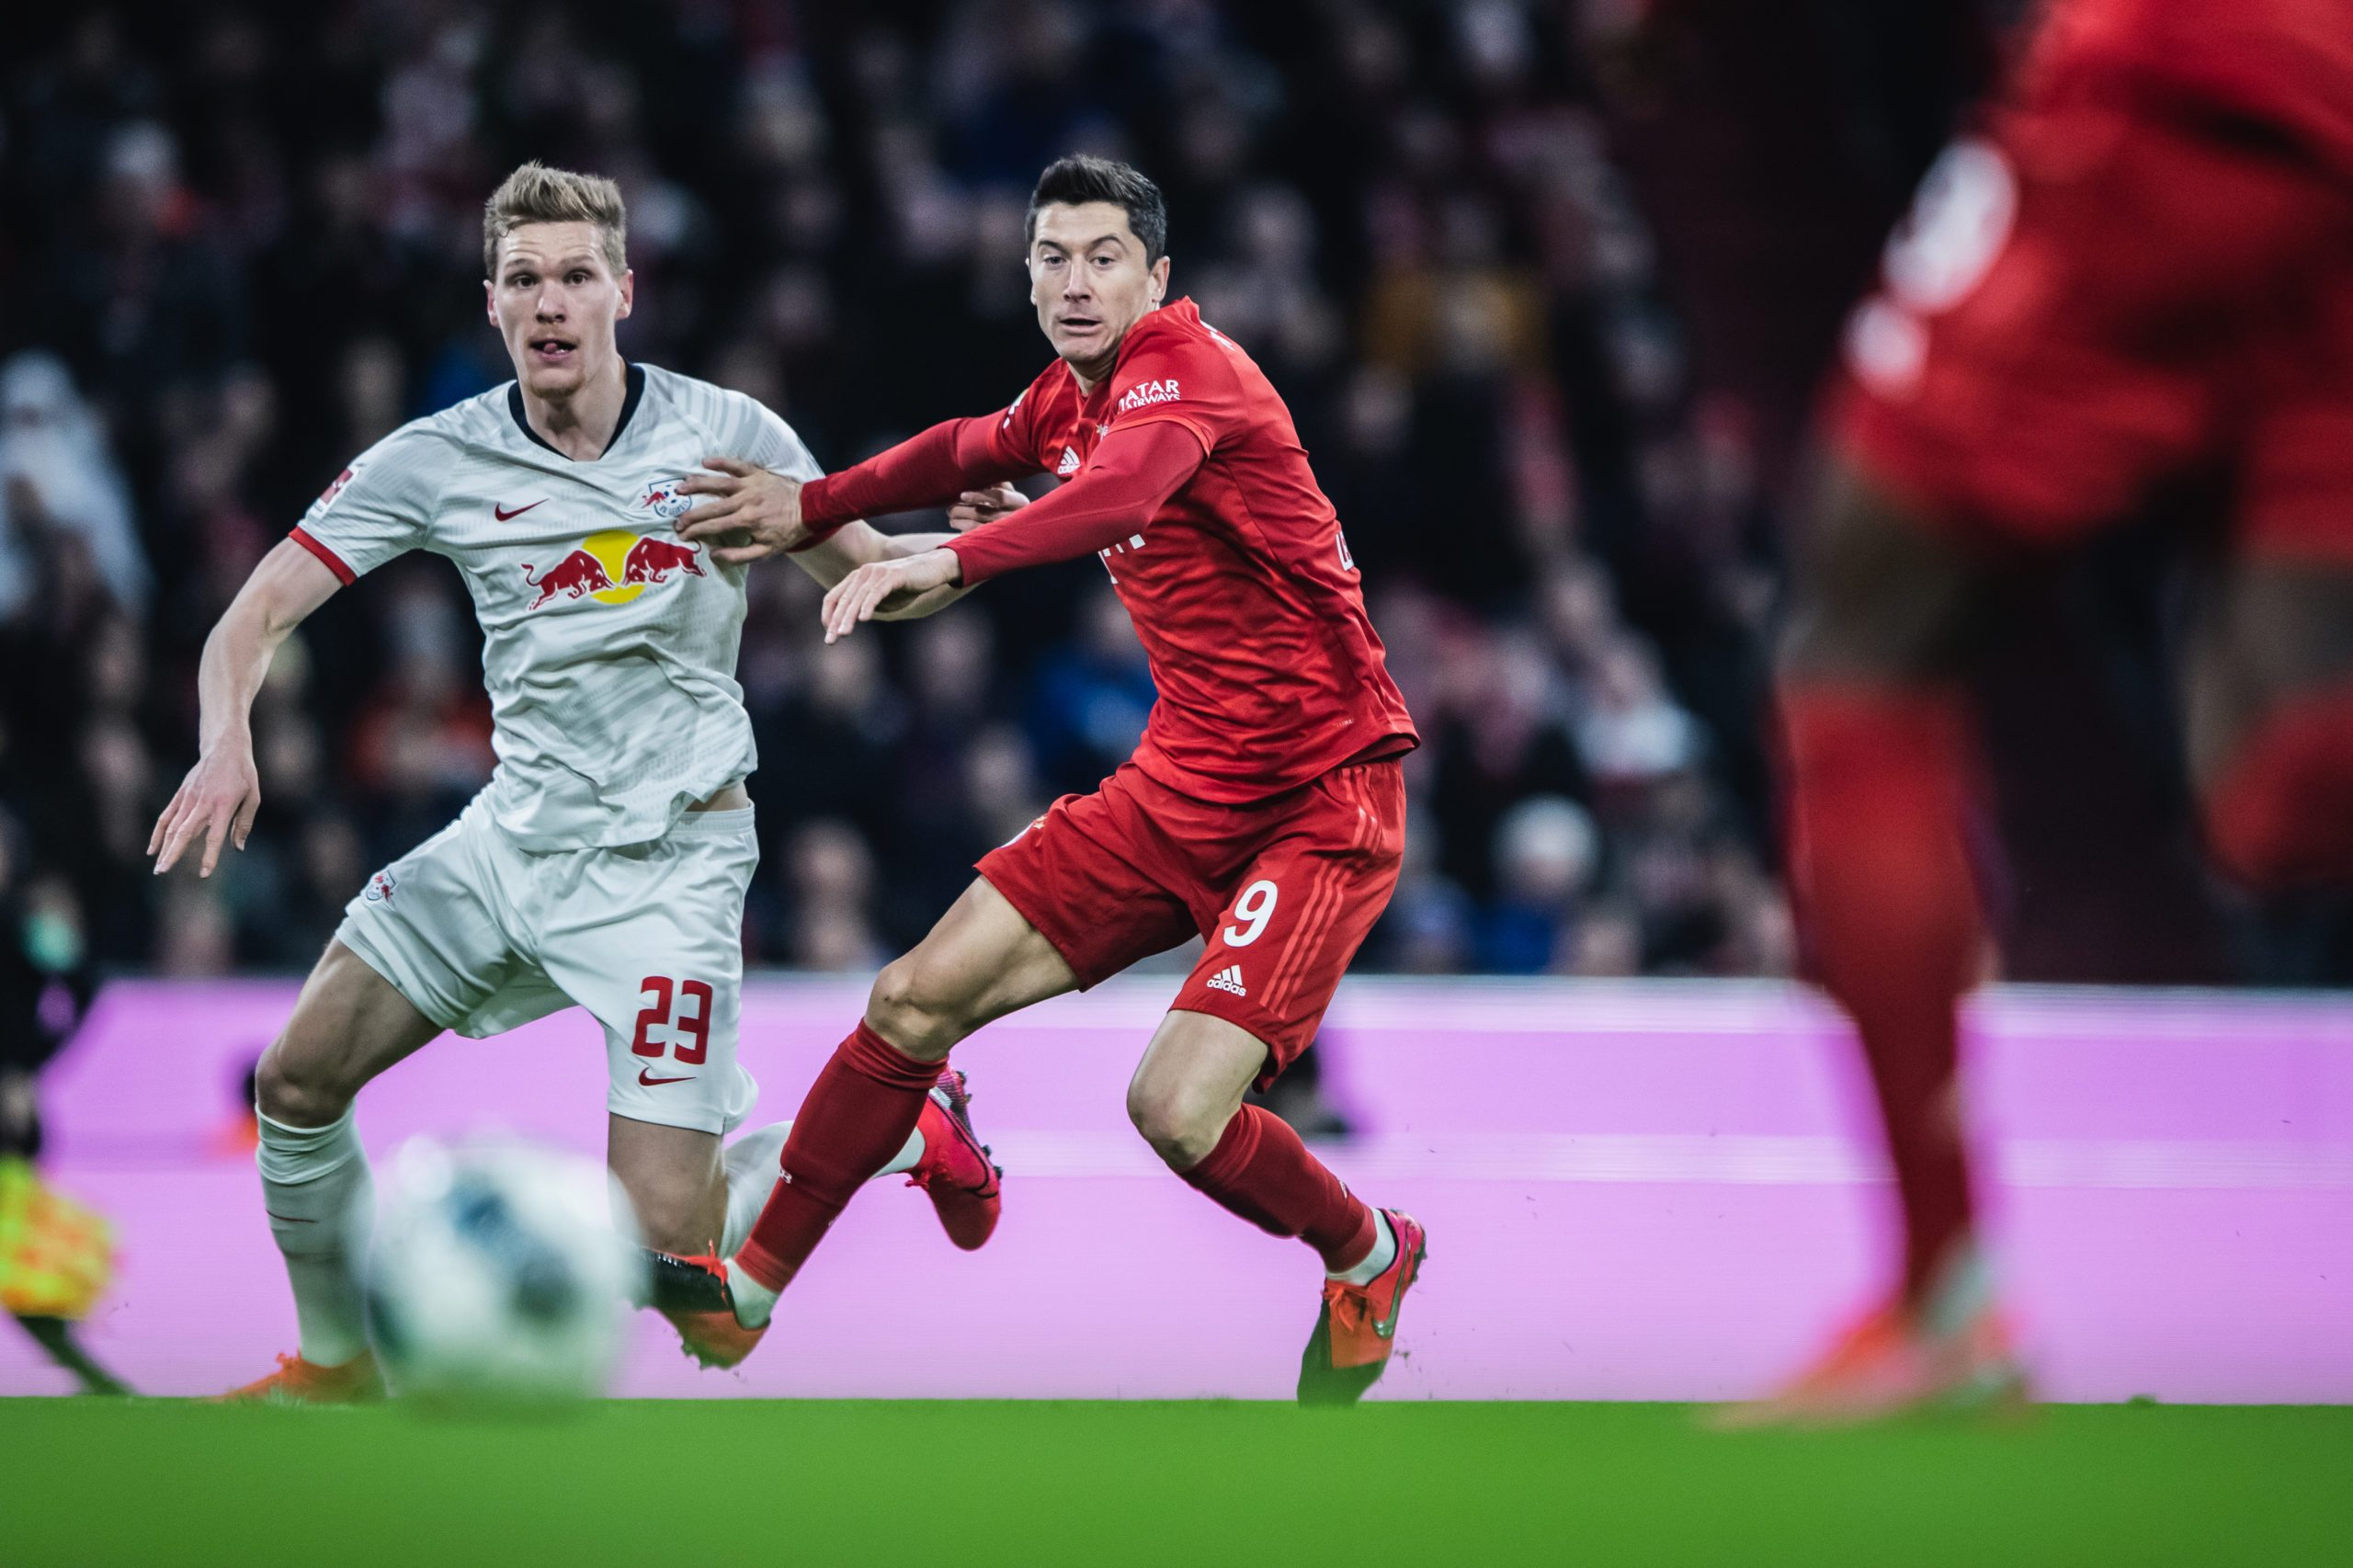 Bayern Munich vs RB Leipzig highlights & video full match